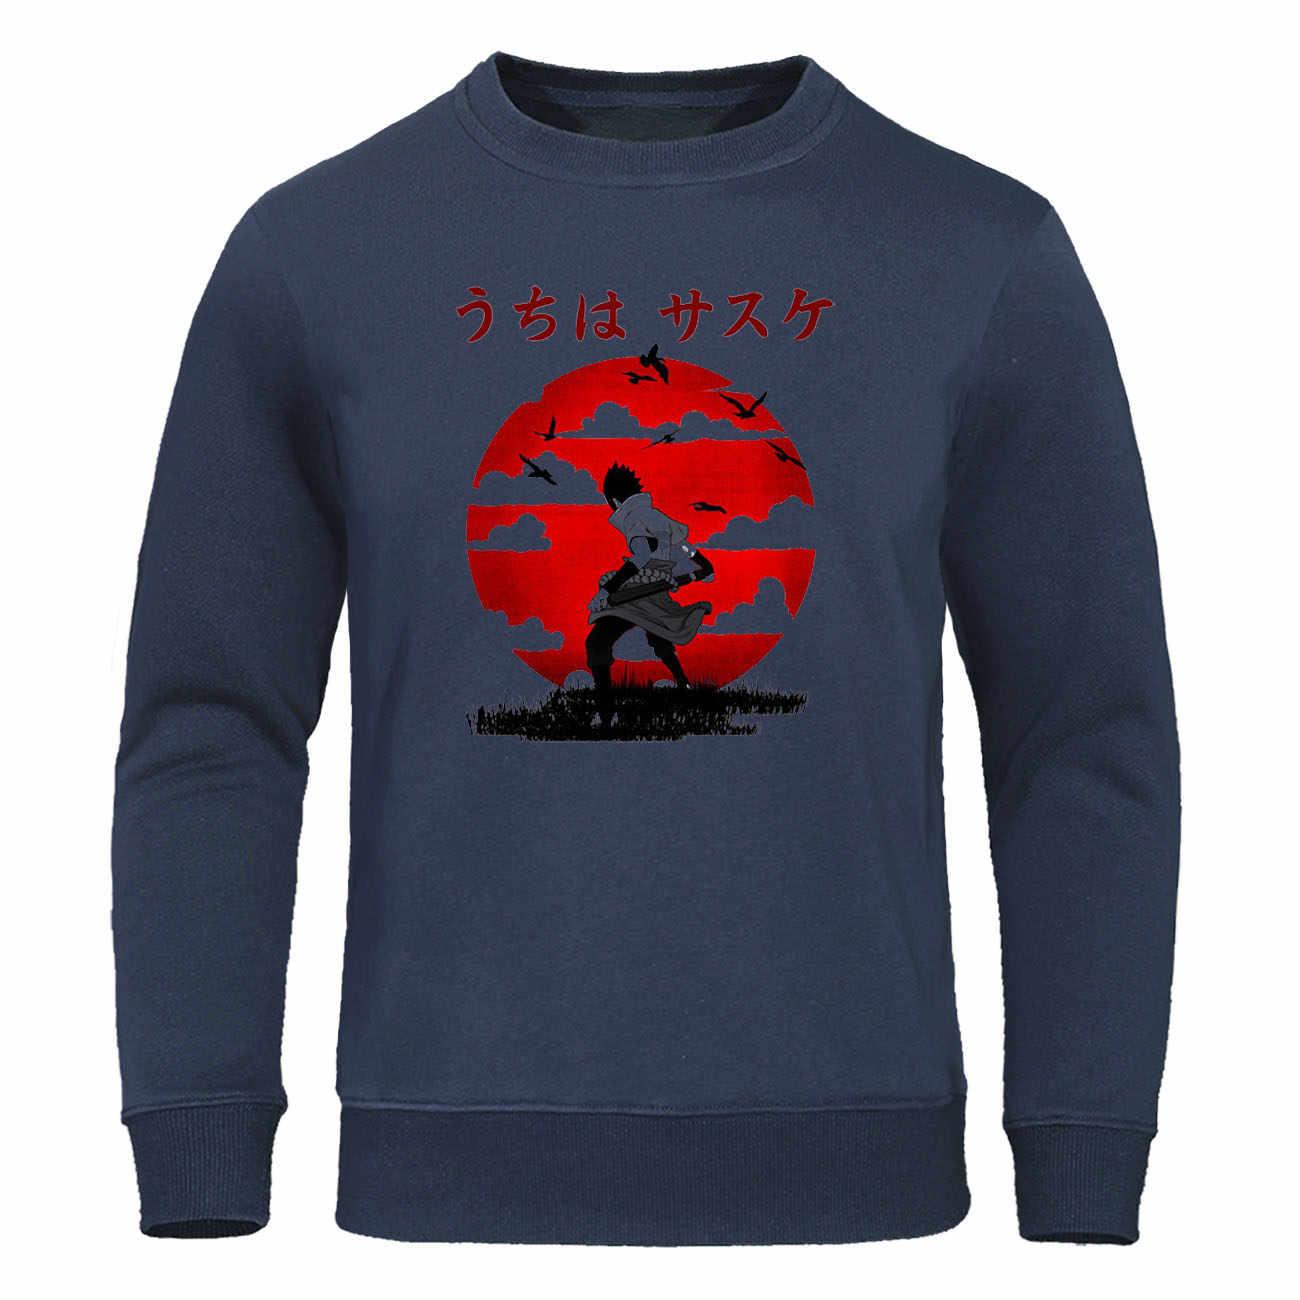 Naruto Männer Kleidung der Japan Anime Hoodies Uchiha Sasuke Itachi Pullover Samurai Sweatshirts Streetwear Männer Casual Harajuku Hoody